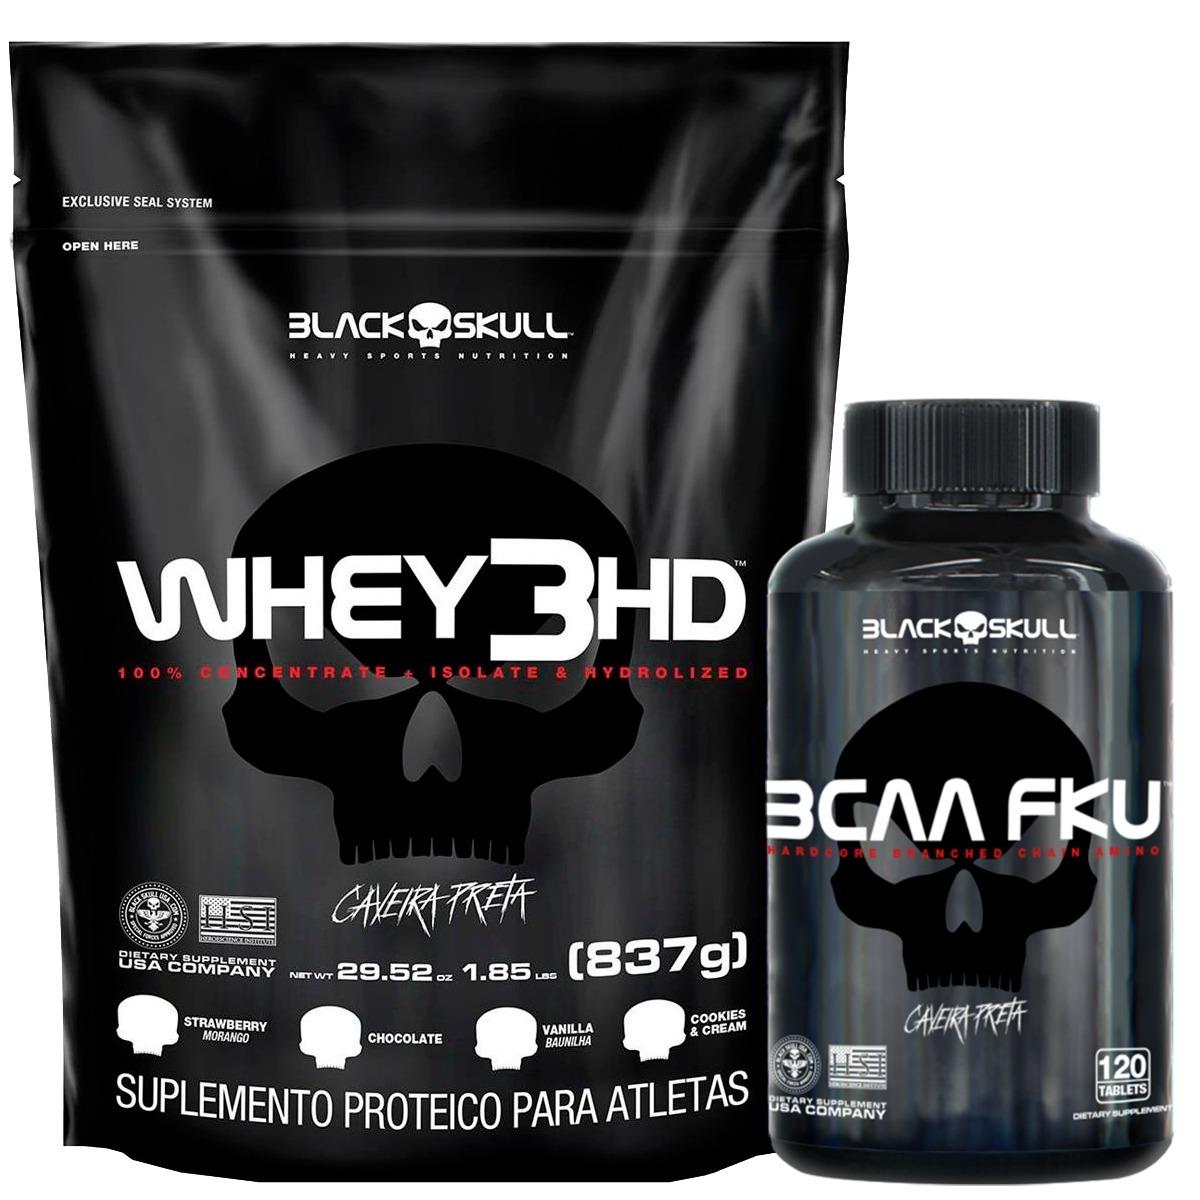 9168bb72a oferta whey 3hd 837gr refil + bcaa fku 120tbl black skull. Carregando zoom.